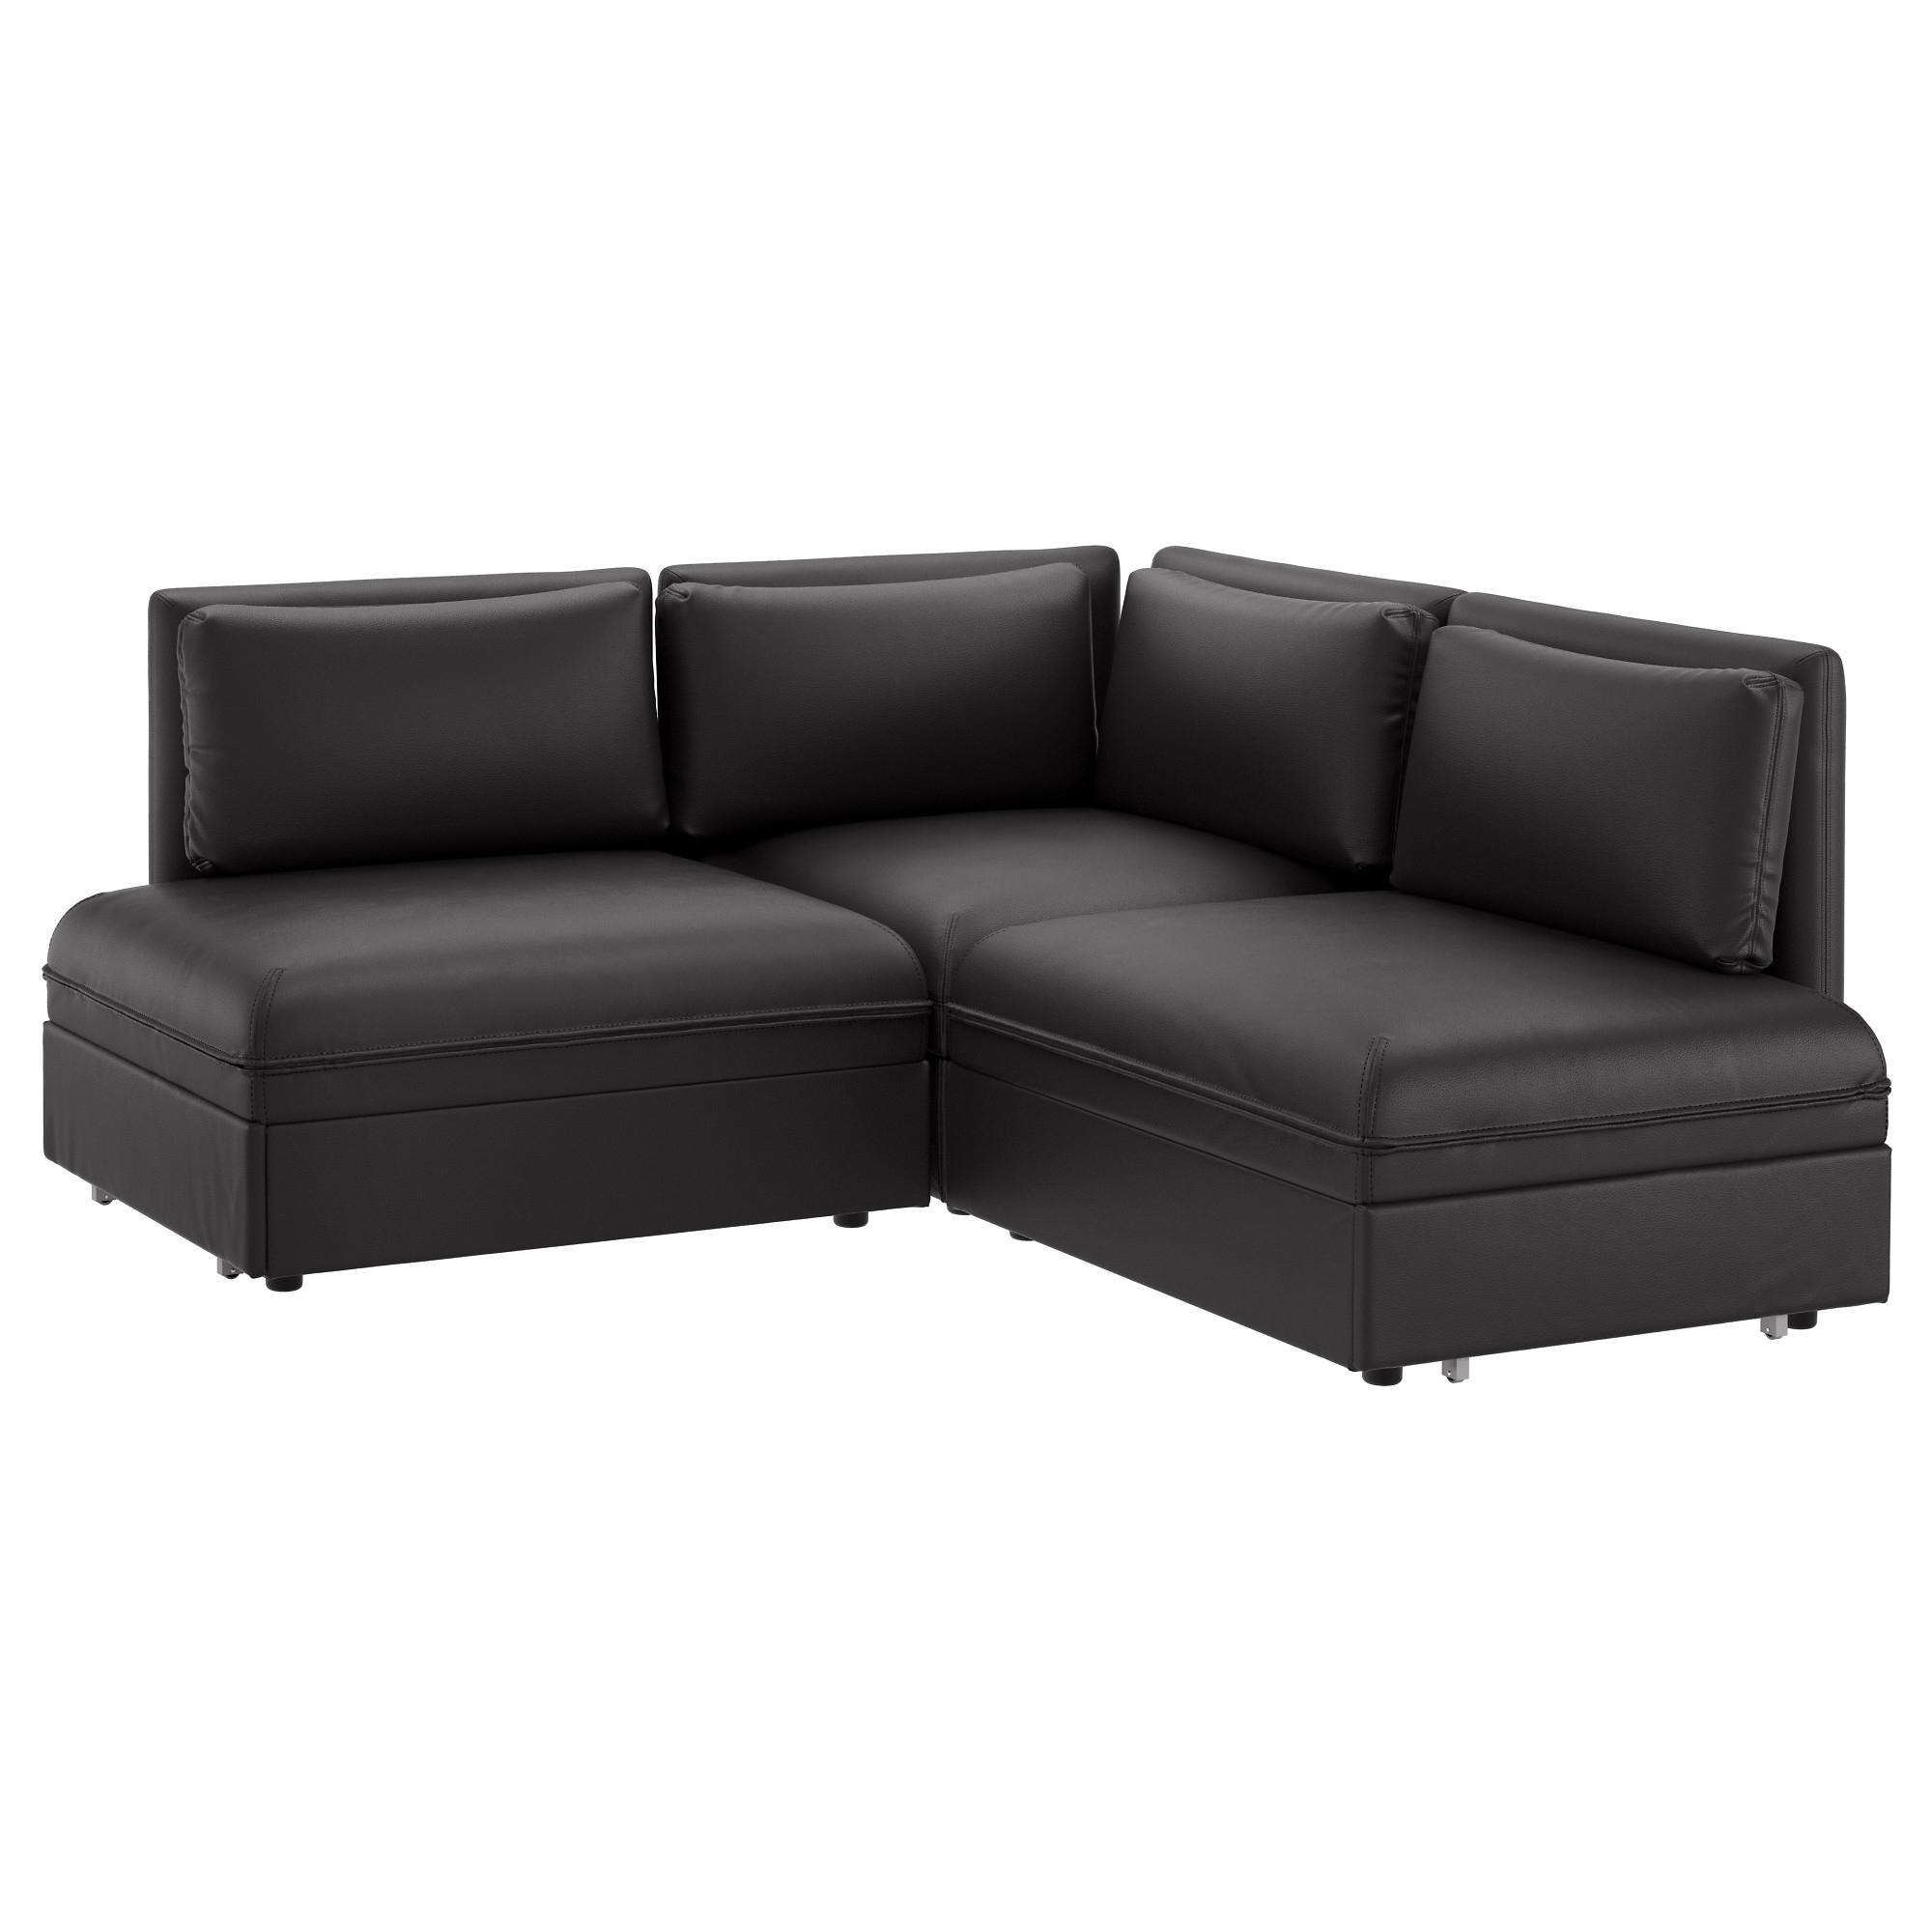 Best And Newest Durham Region Sectional Sofas Inside Vallentuna Sleeper Sectional, 2 Seat – Orrsta Beige – Ikea (View 3 of 20)